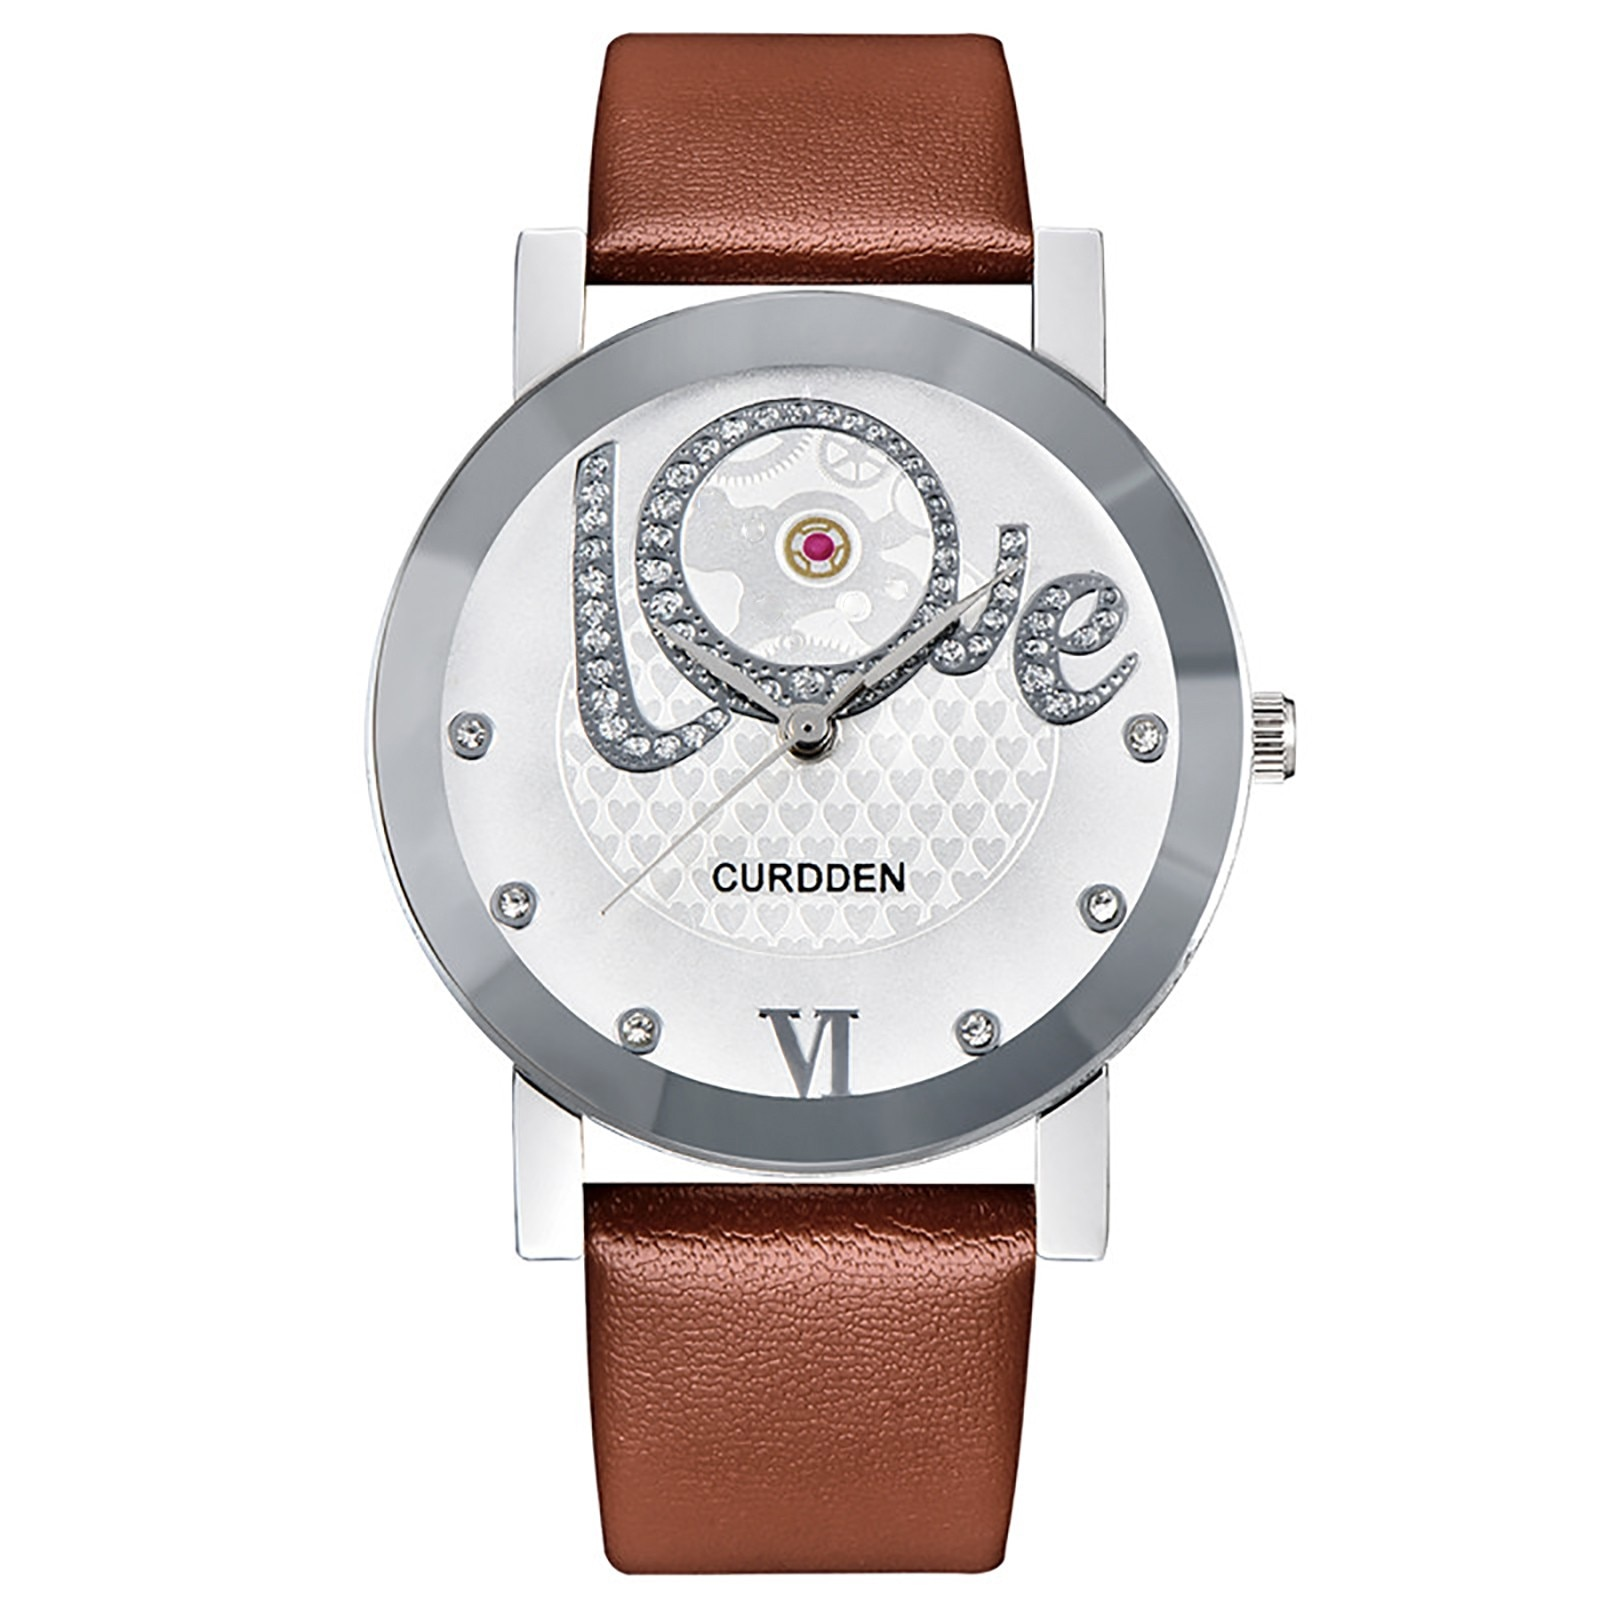 Watches Women Fashion Leather Strap Flower Female Clock Ladies Quartz Wrist Watch Montre Femme Relog